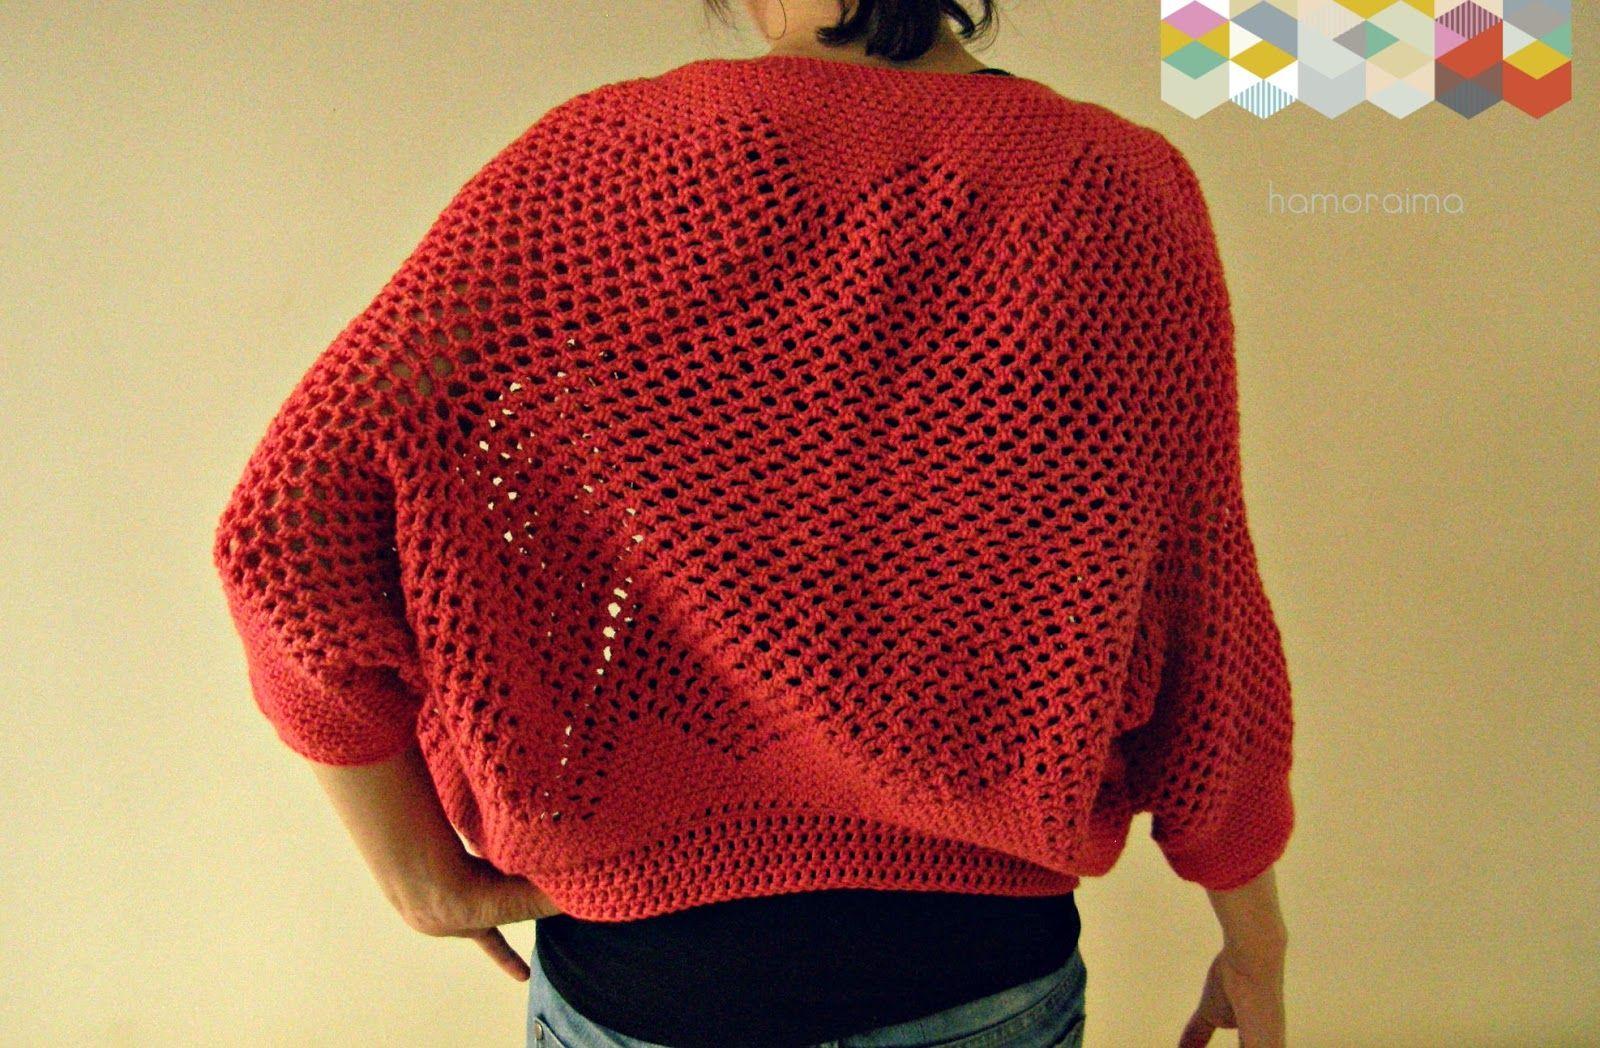 patrón chaqueta crochet | ▽ crochet • ganchillo ▽ | Pinterest ...